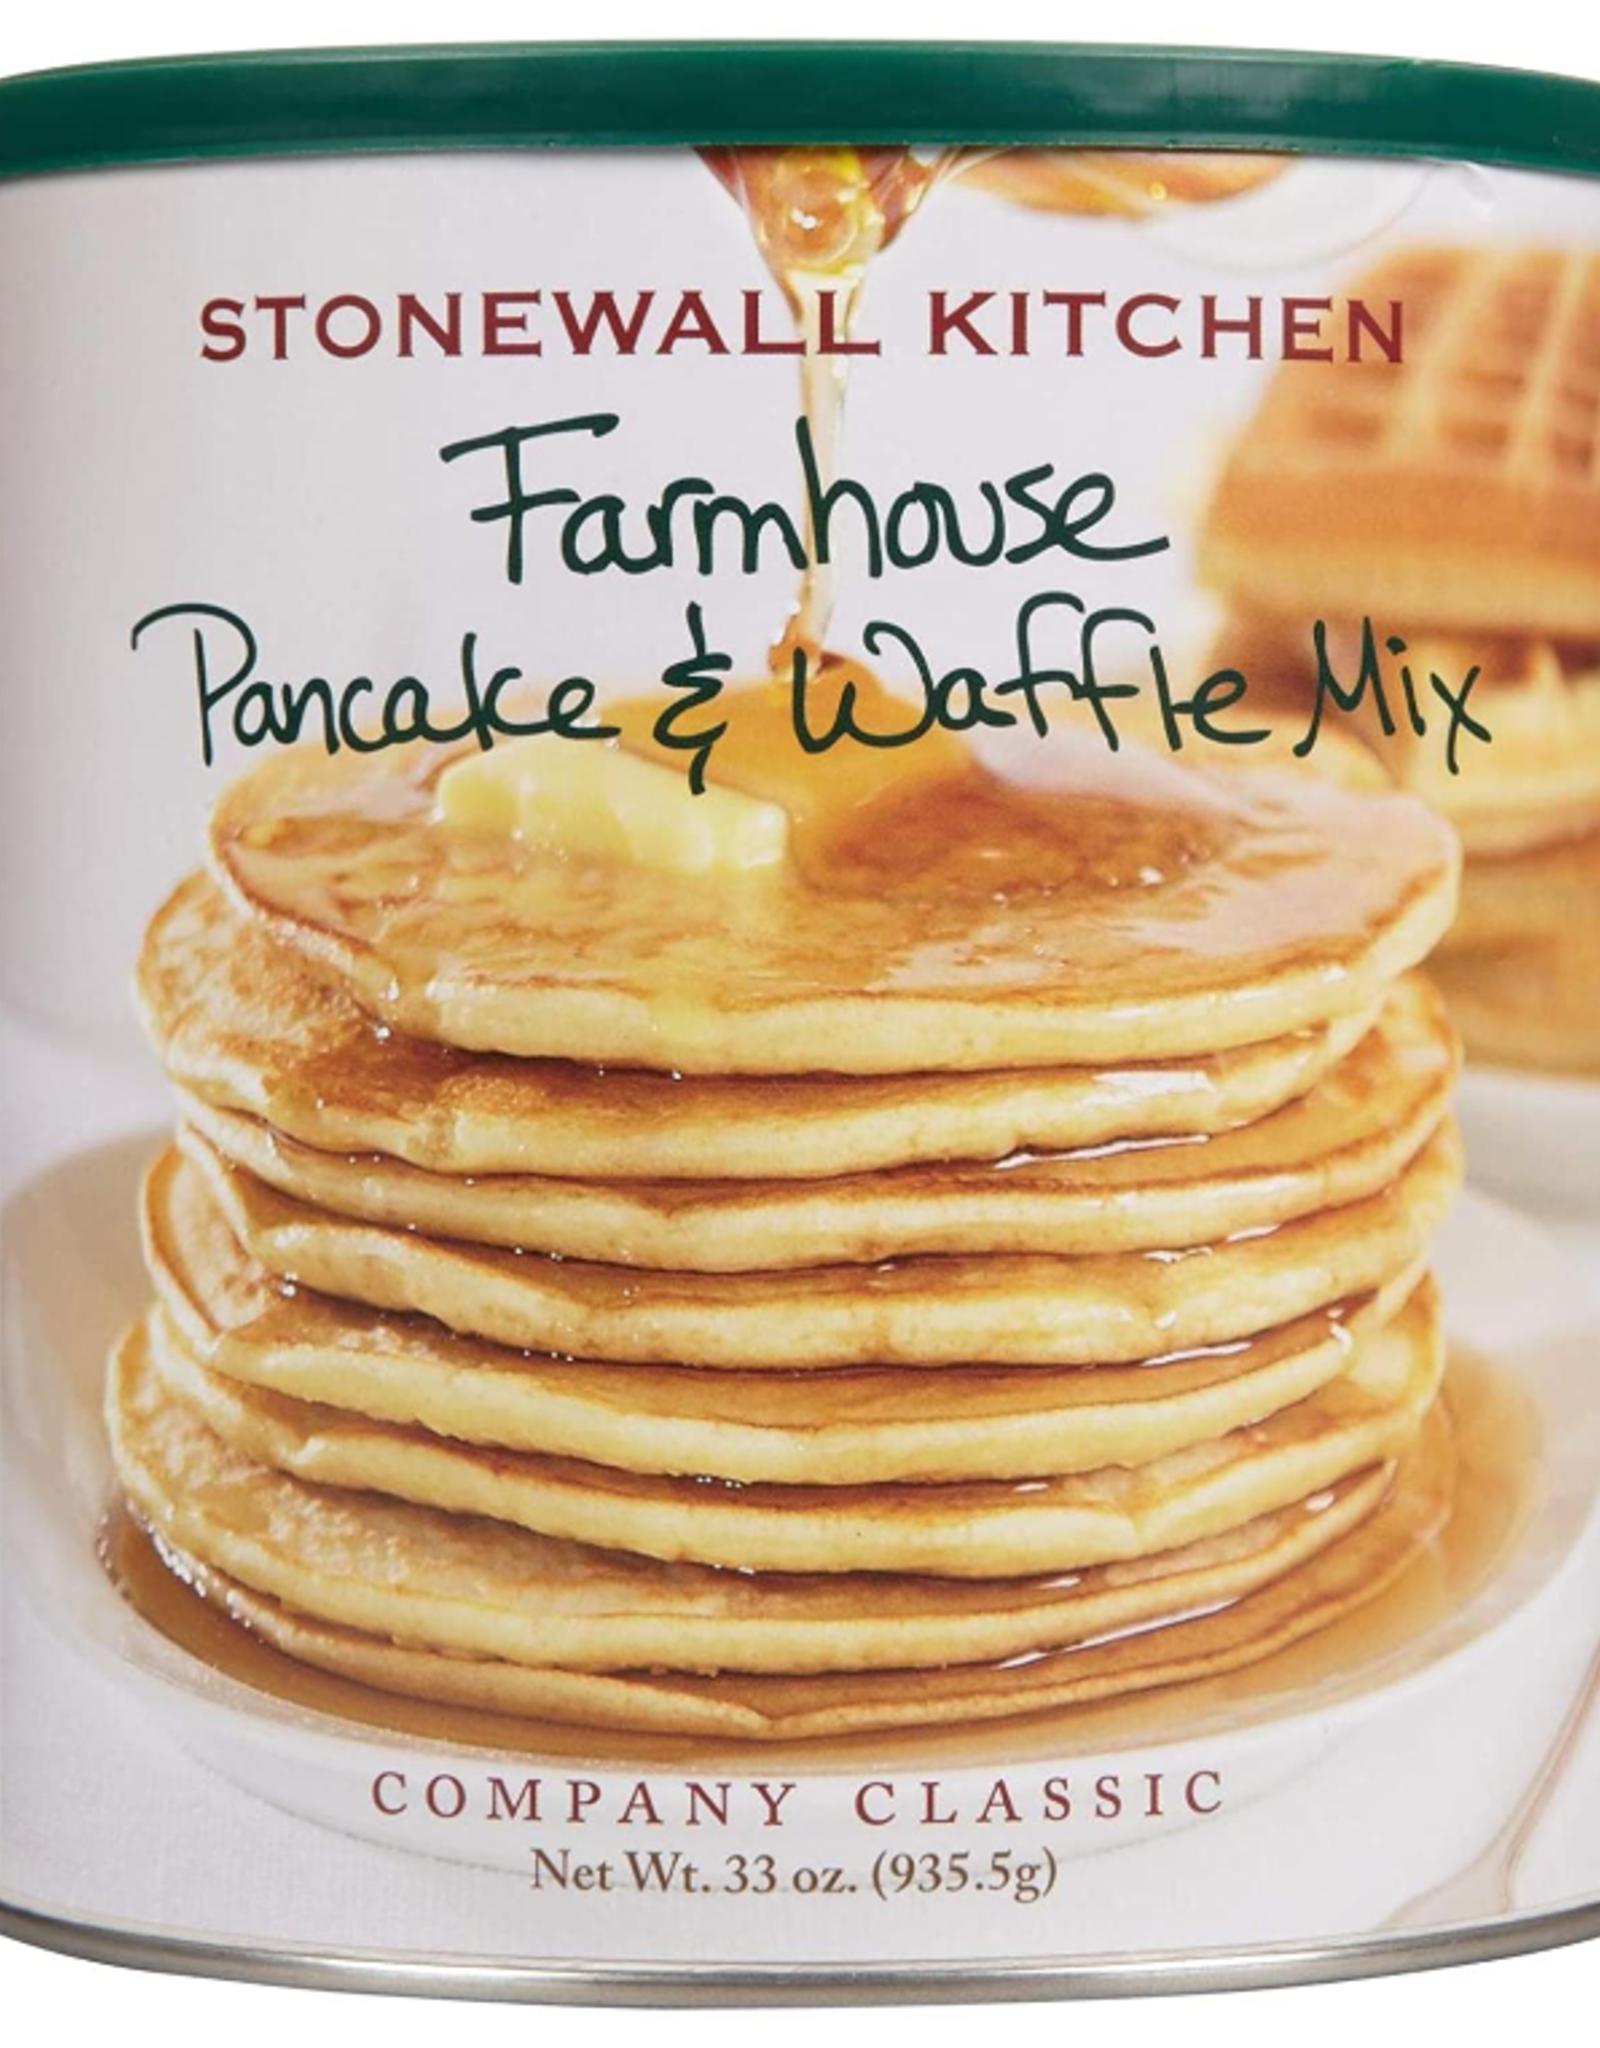 Stonewall Kitchen Farmhouse Pancake & Waffle Mix, 33oz can